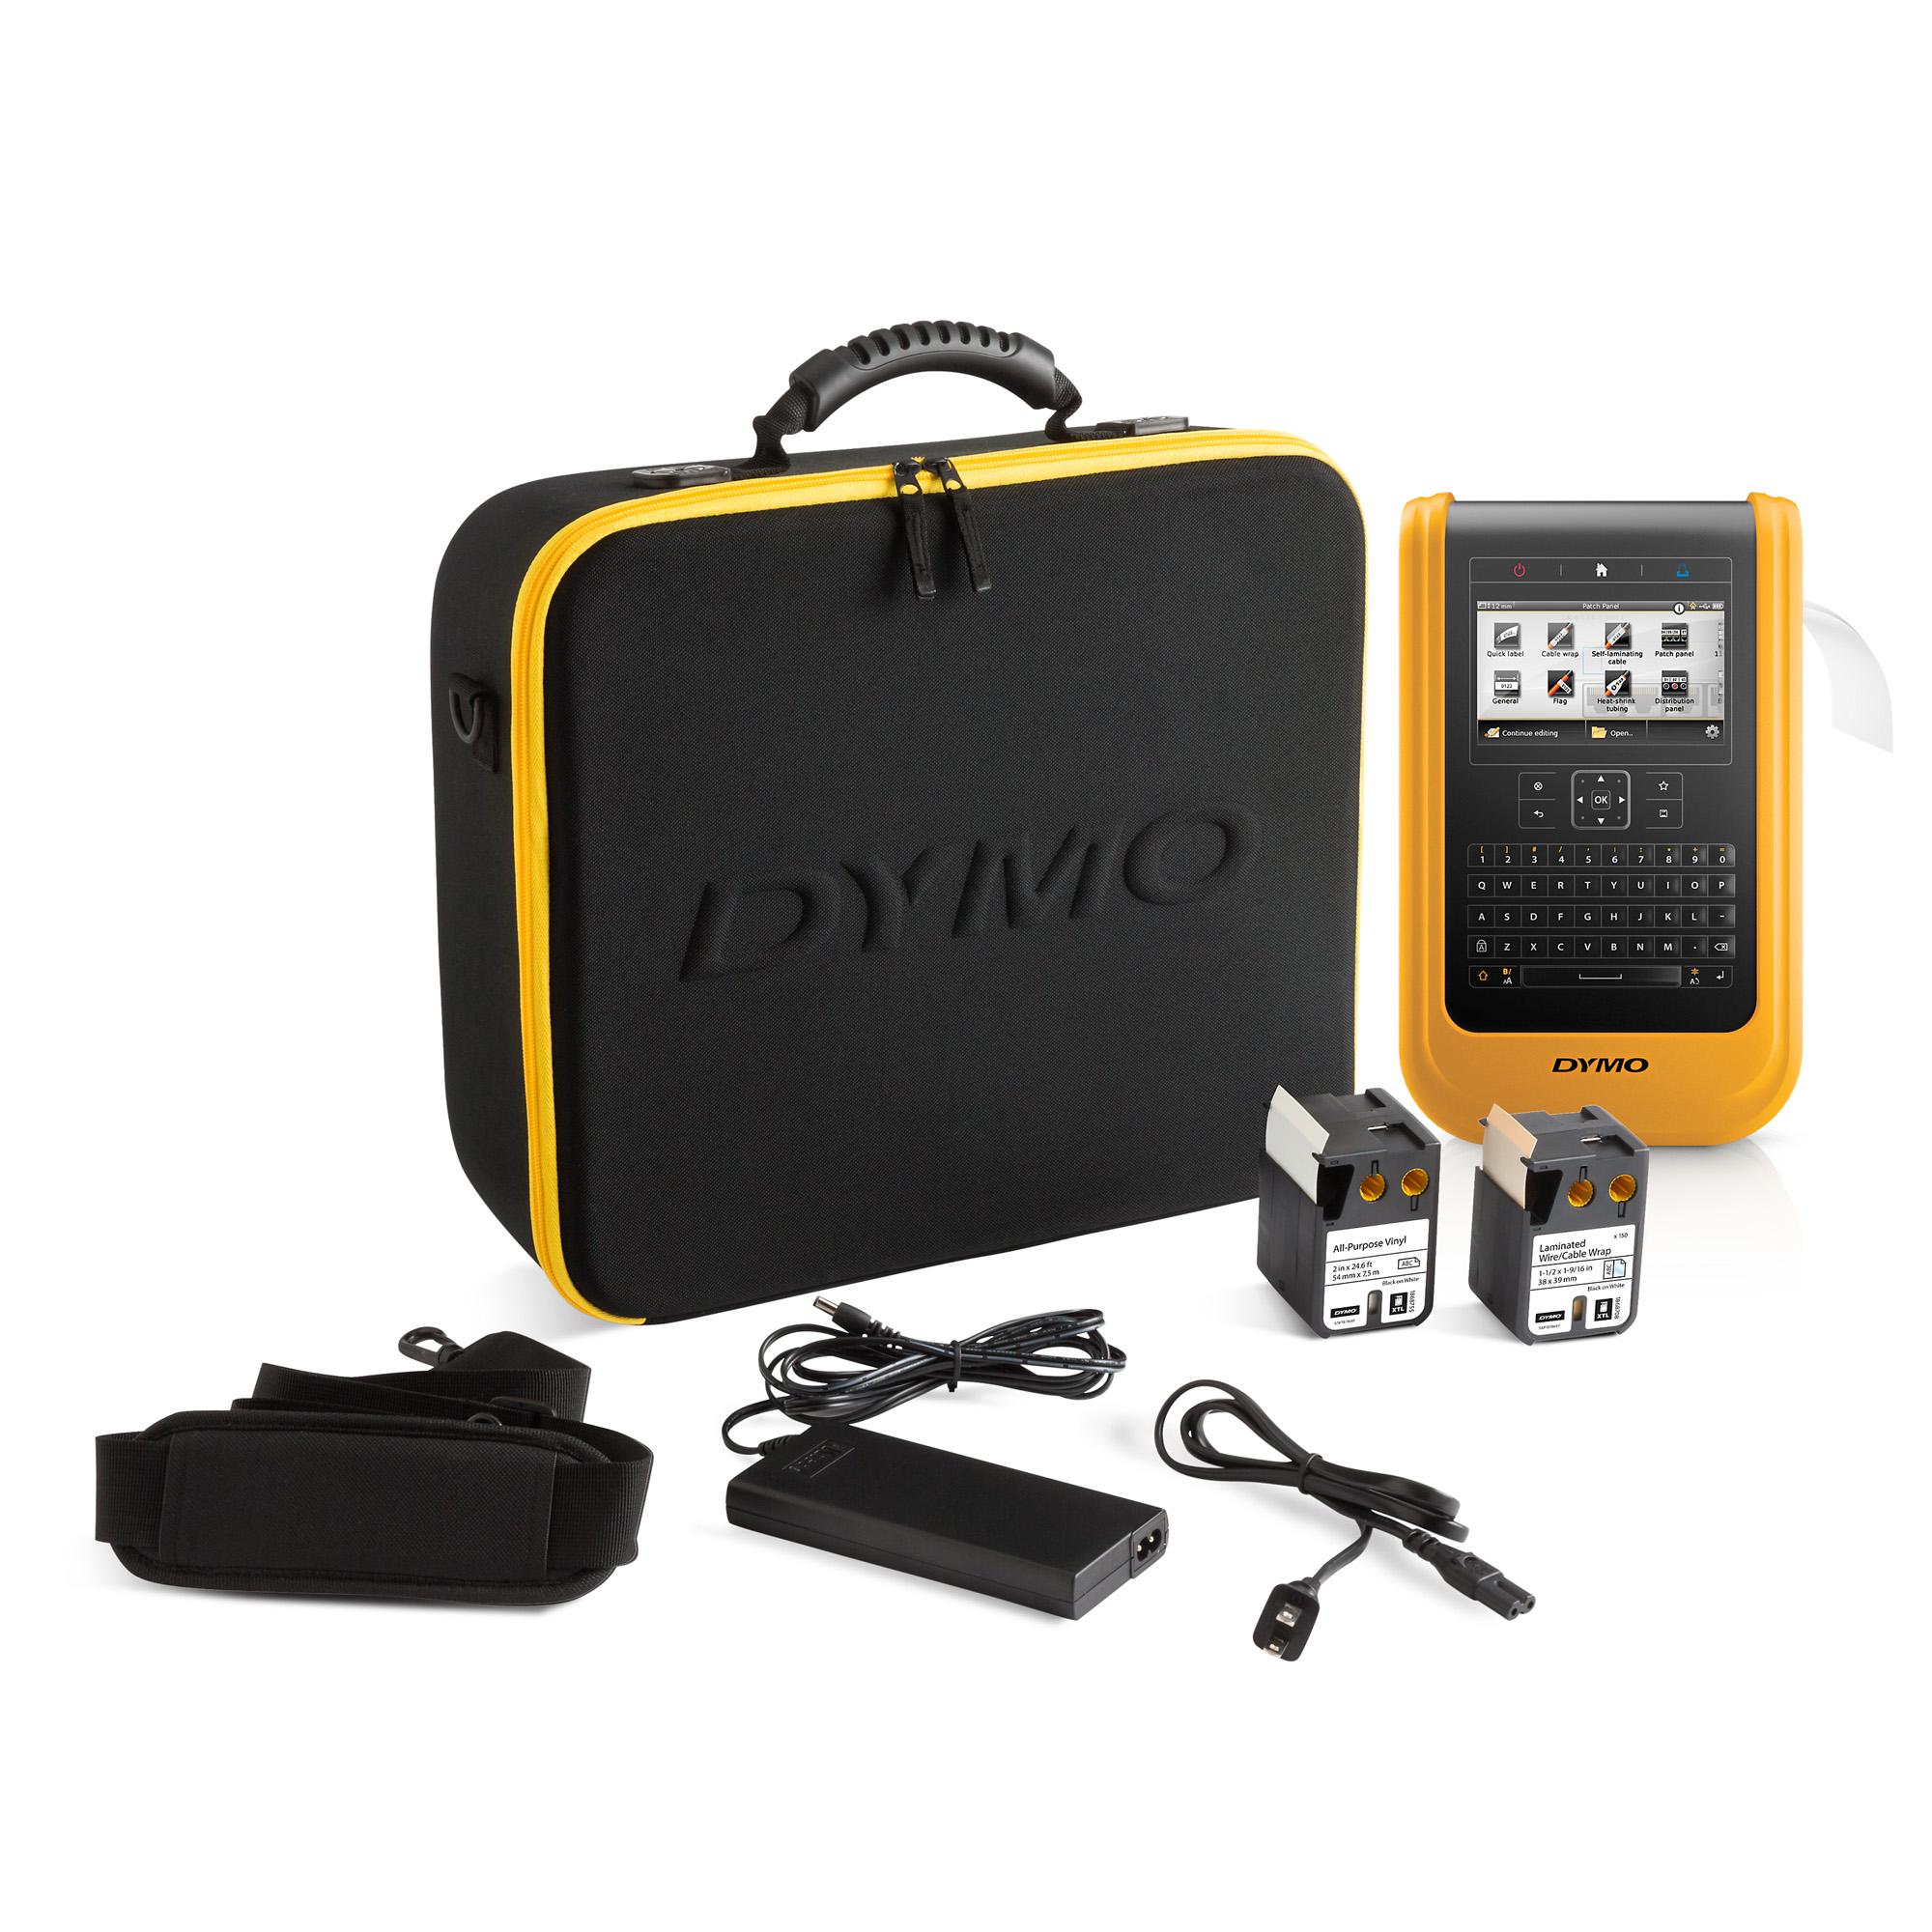 Dymo XTL 500 Kit - Dymo Label Printers from The Dymo Shop